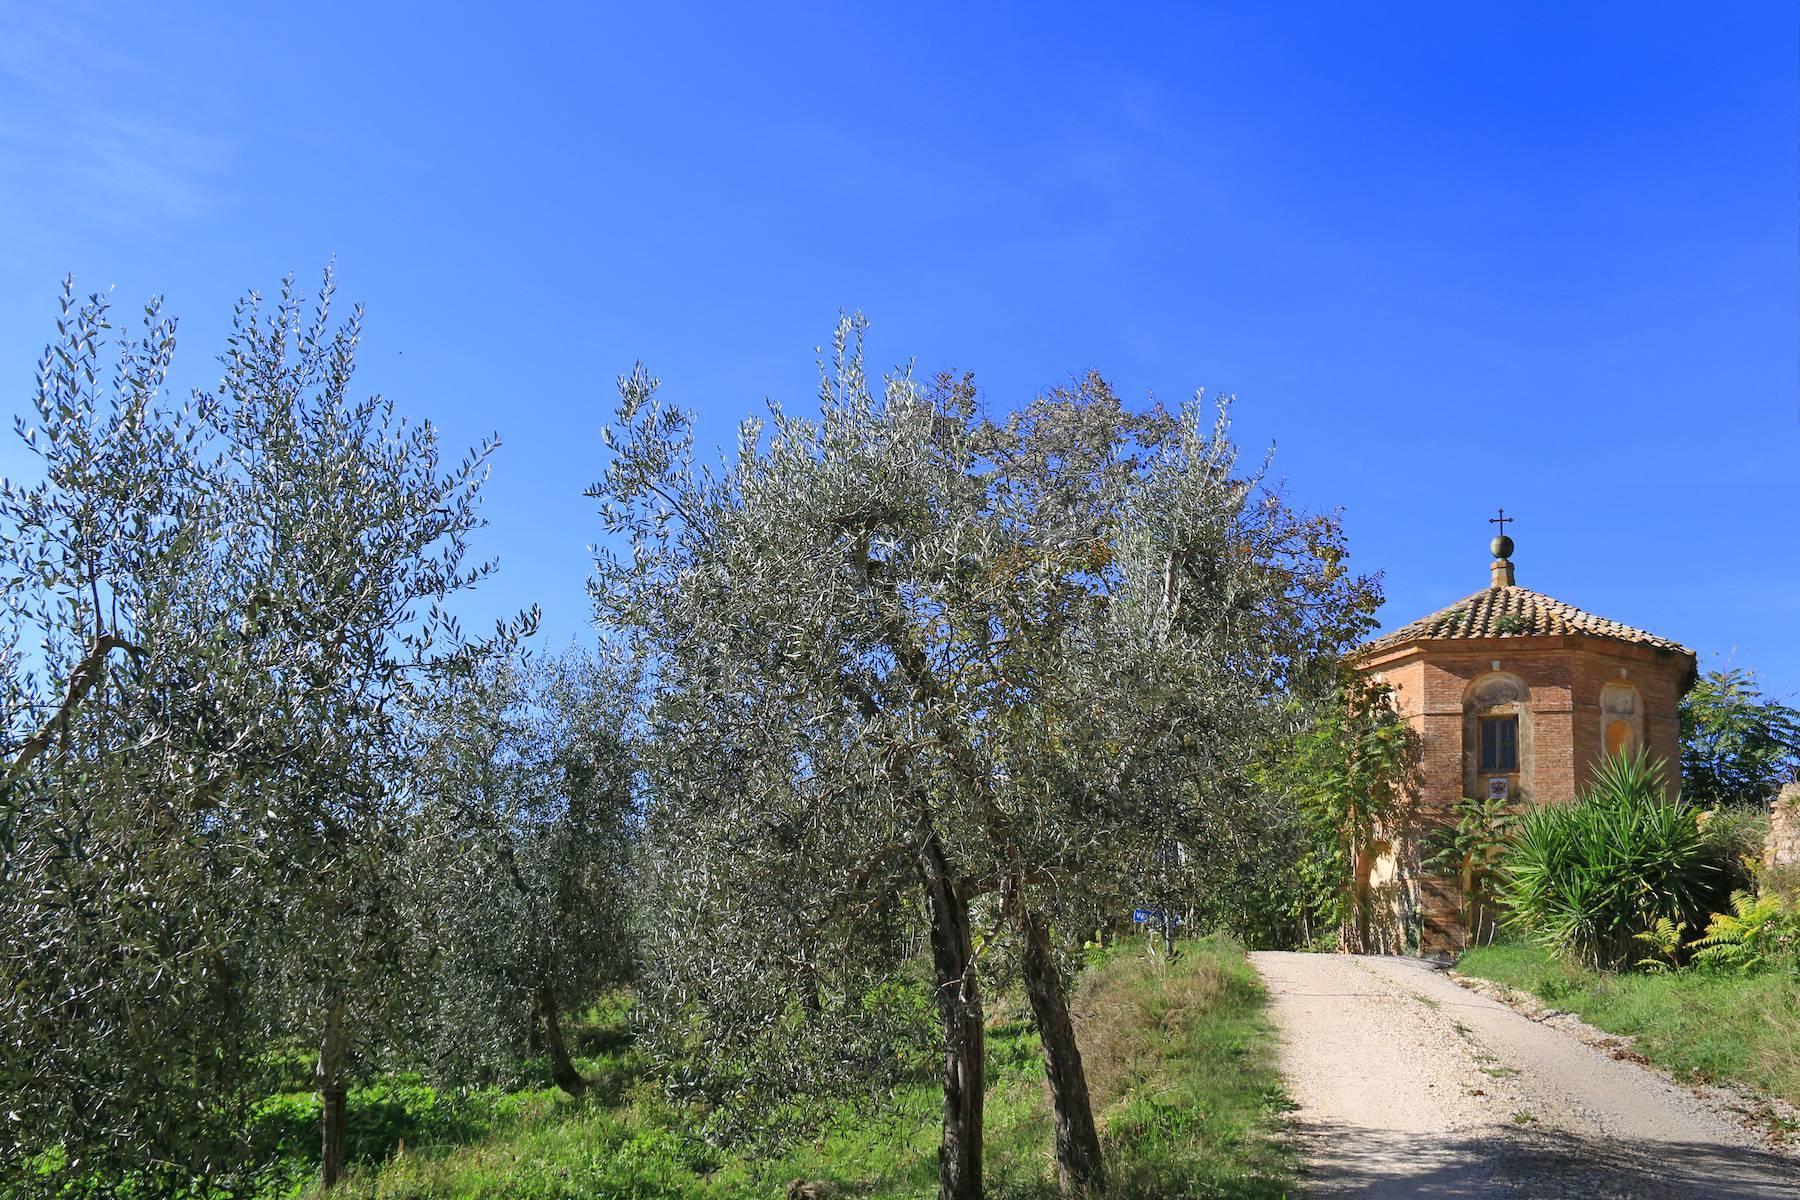 Wunderschönes Schloss im Herzen der Toskana - 8